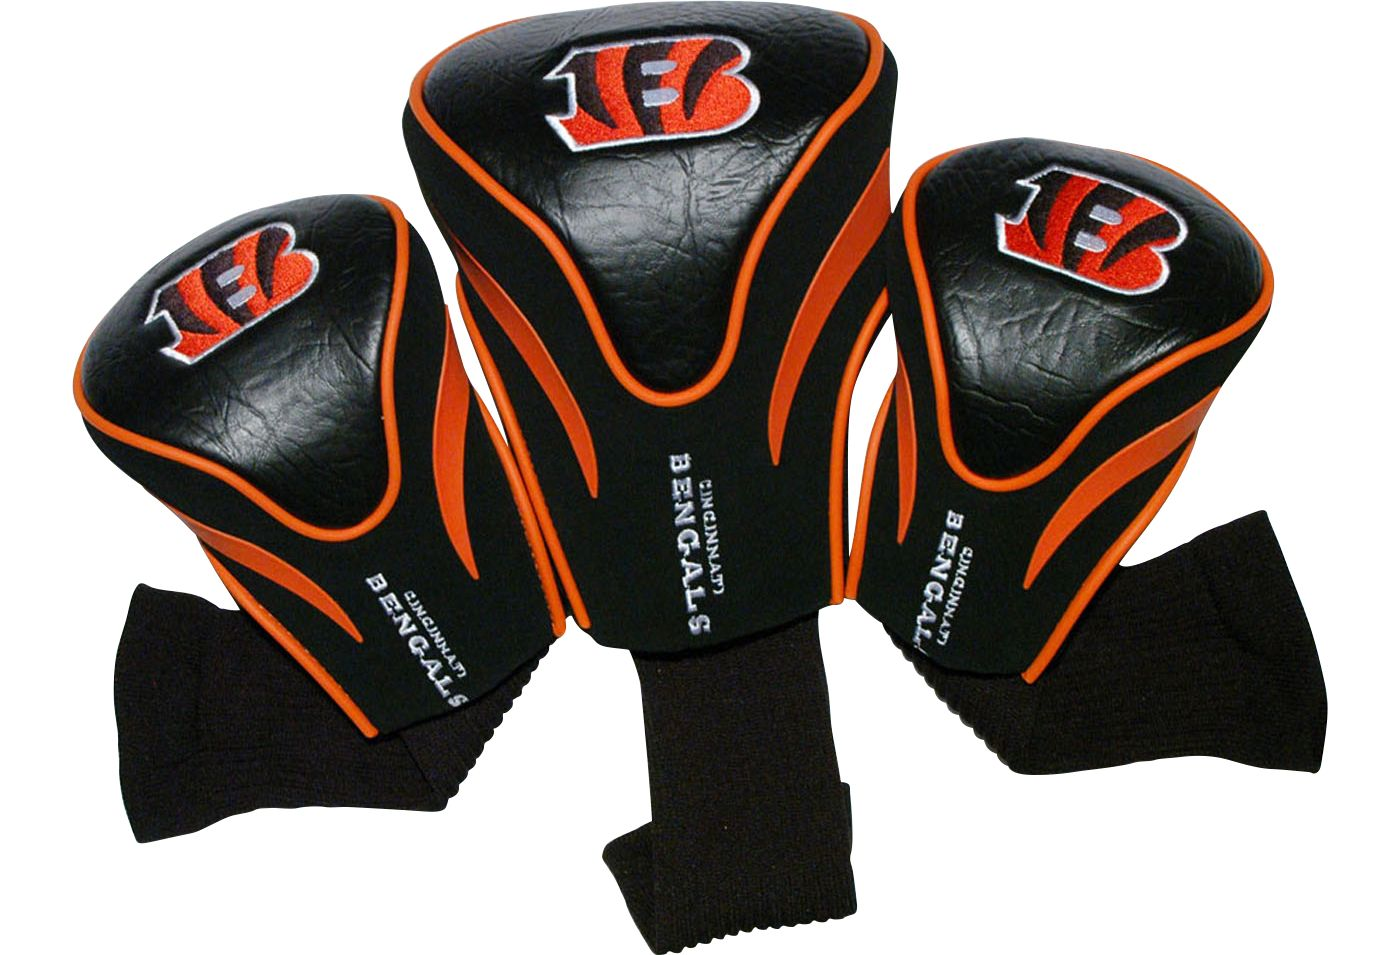 Team Golf Cincinnati Bengals Contour Sock Headcovers - 3 Pack